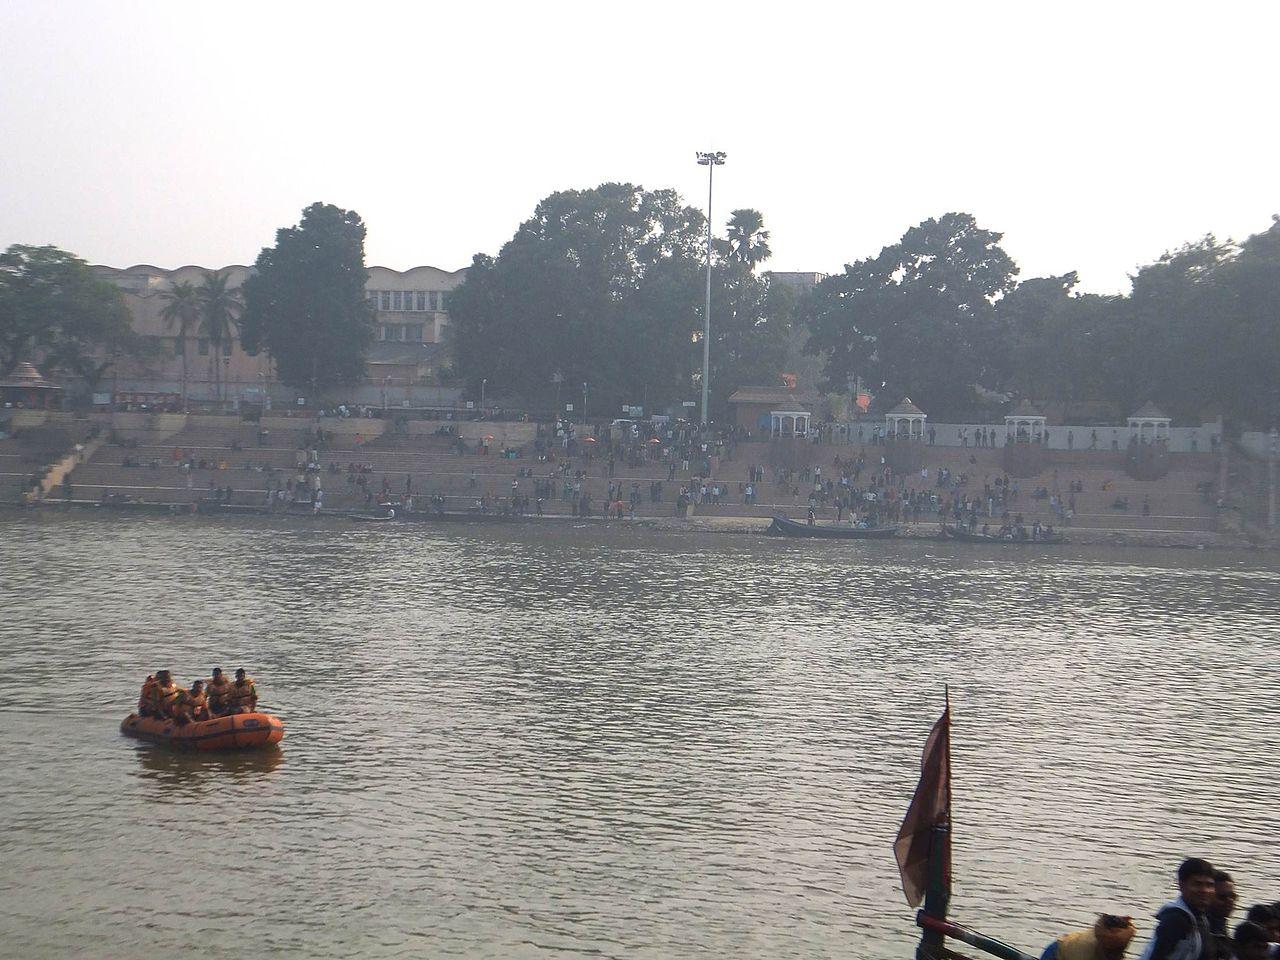 Sightseeing Place to Visit In Patna-Gandhi Ghat